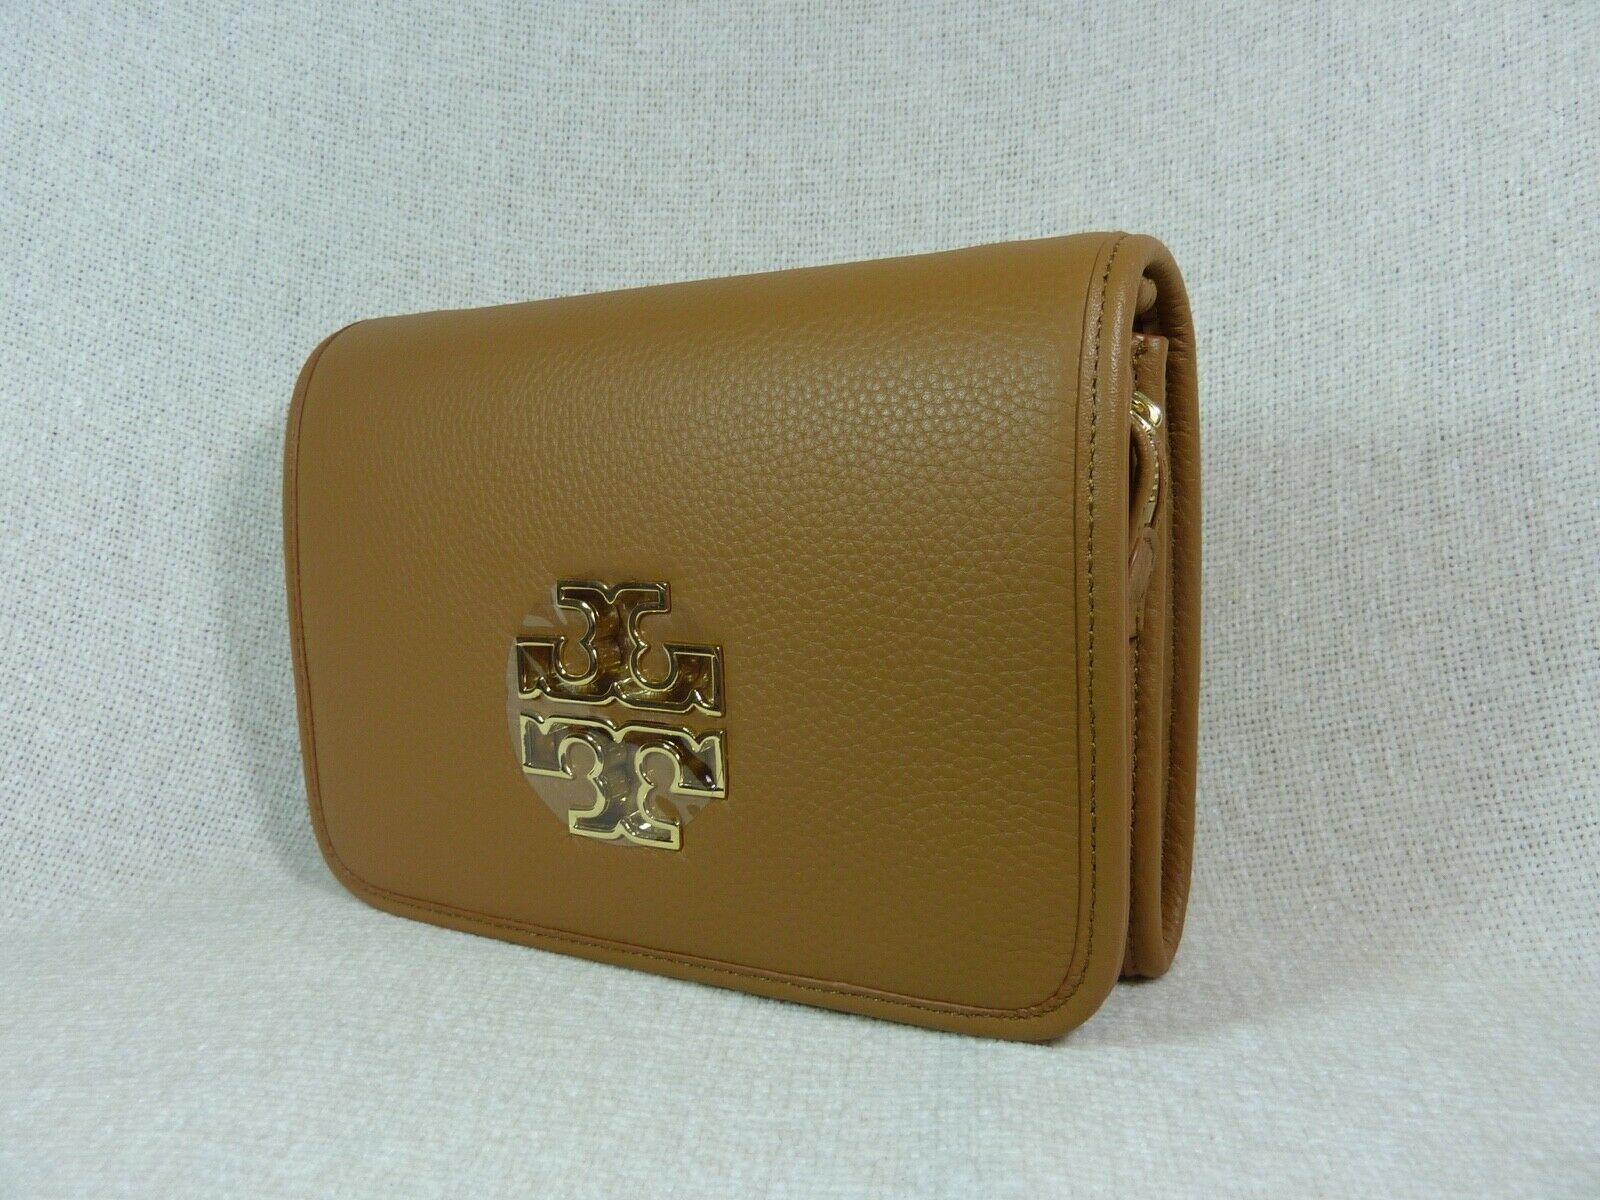 NWT Tory Burch Bark Leather Britten Combo Cross Body bag/Clutch  - $425 image 3